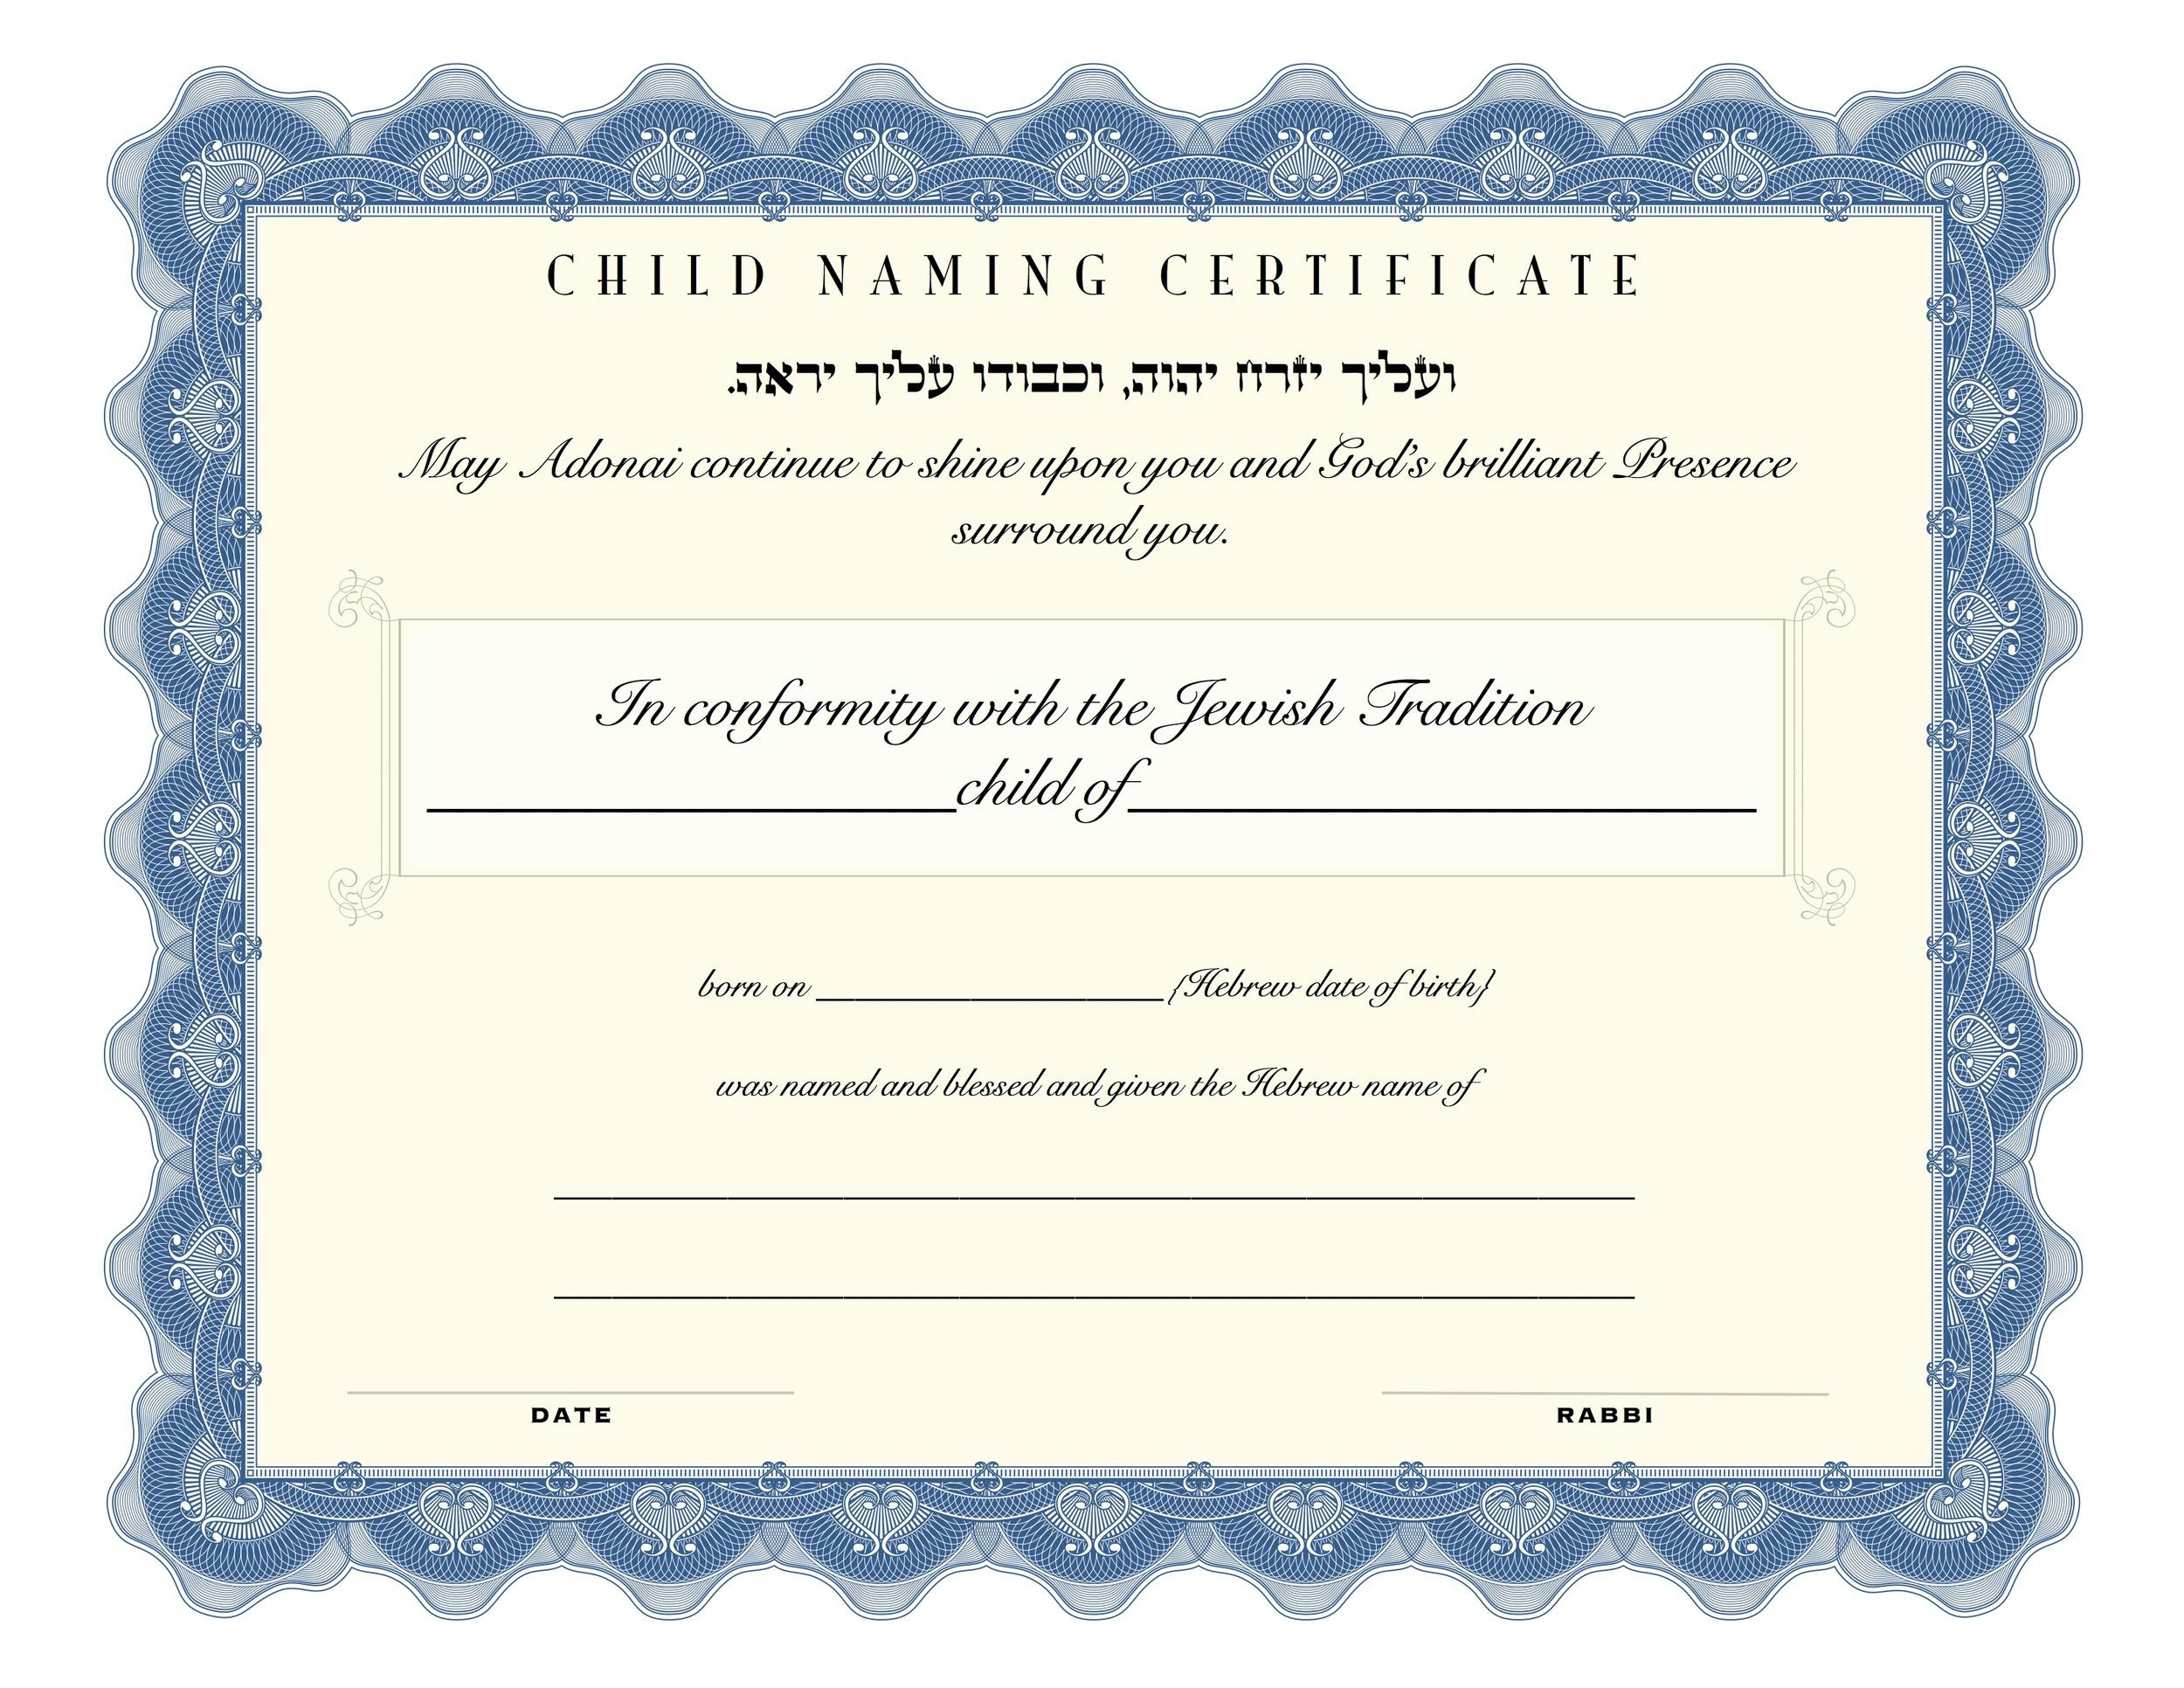 BabyNamingCertificate.jpg